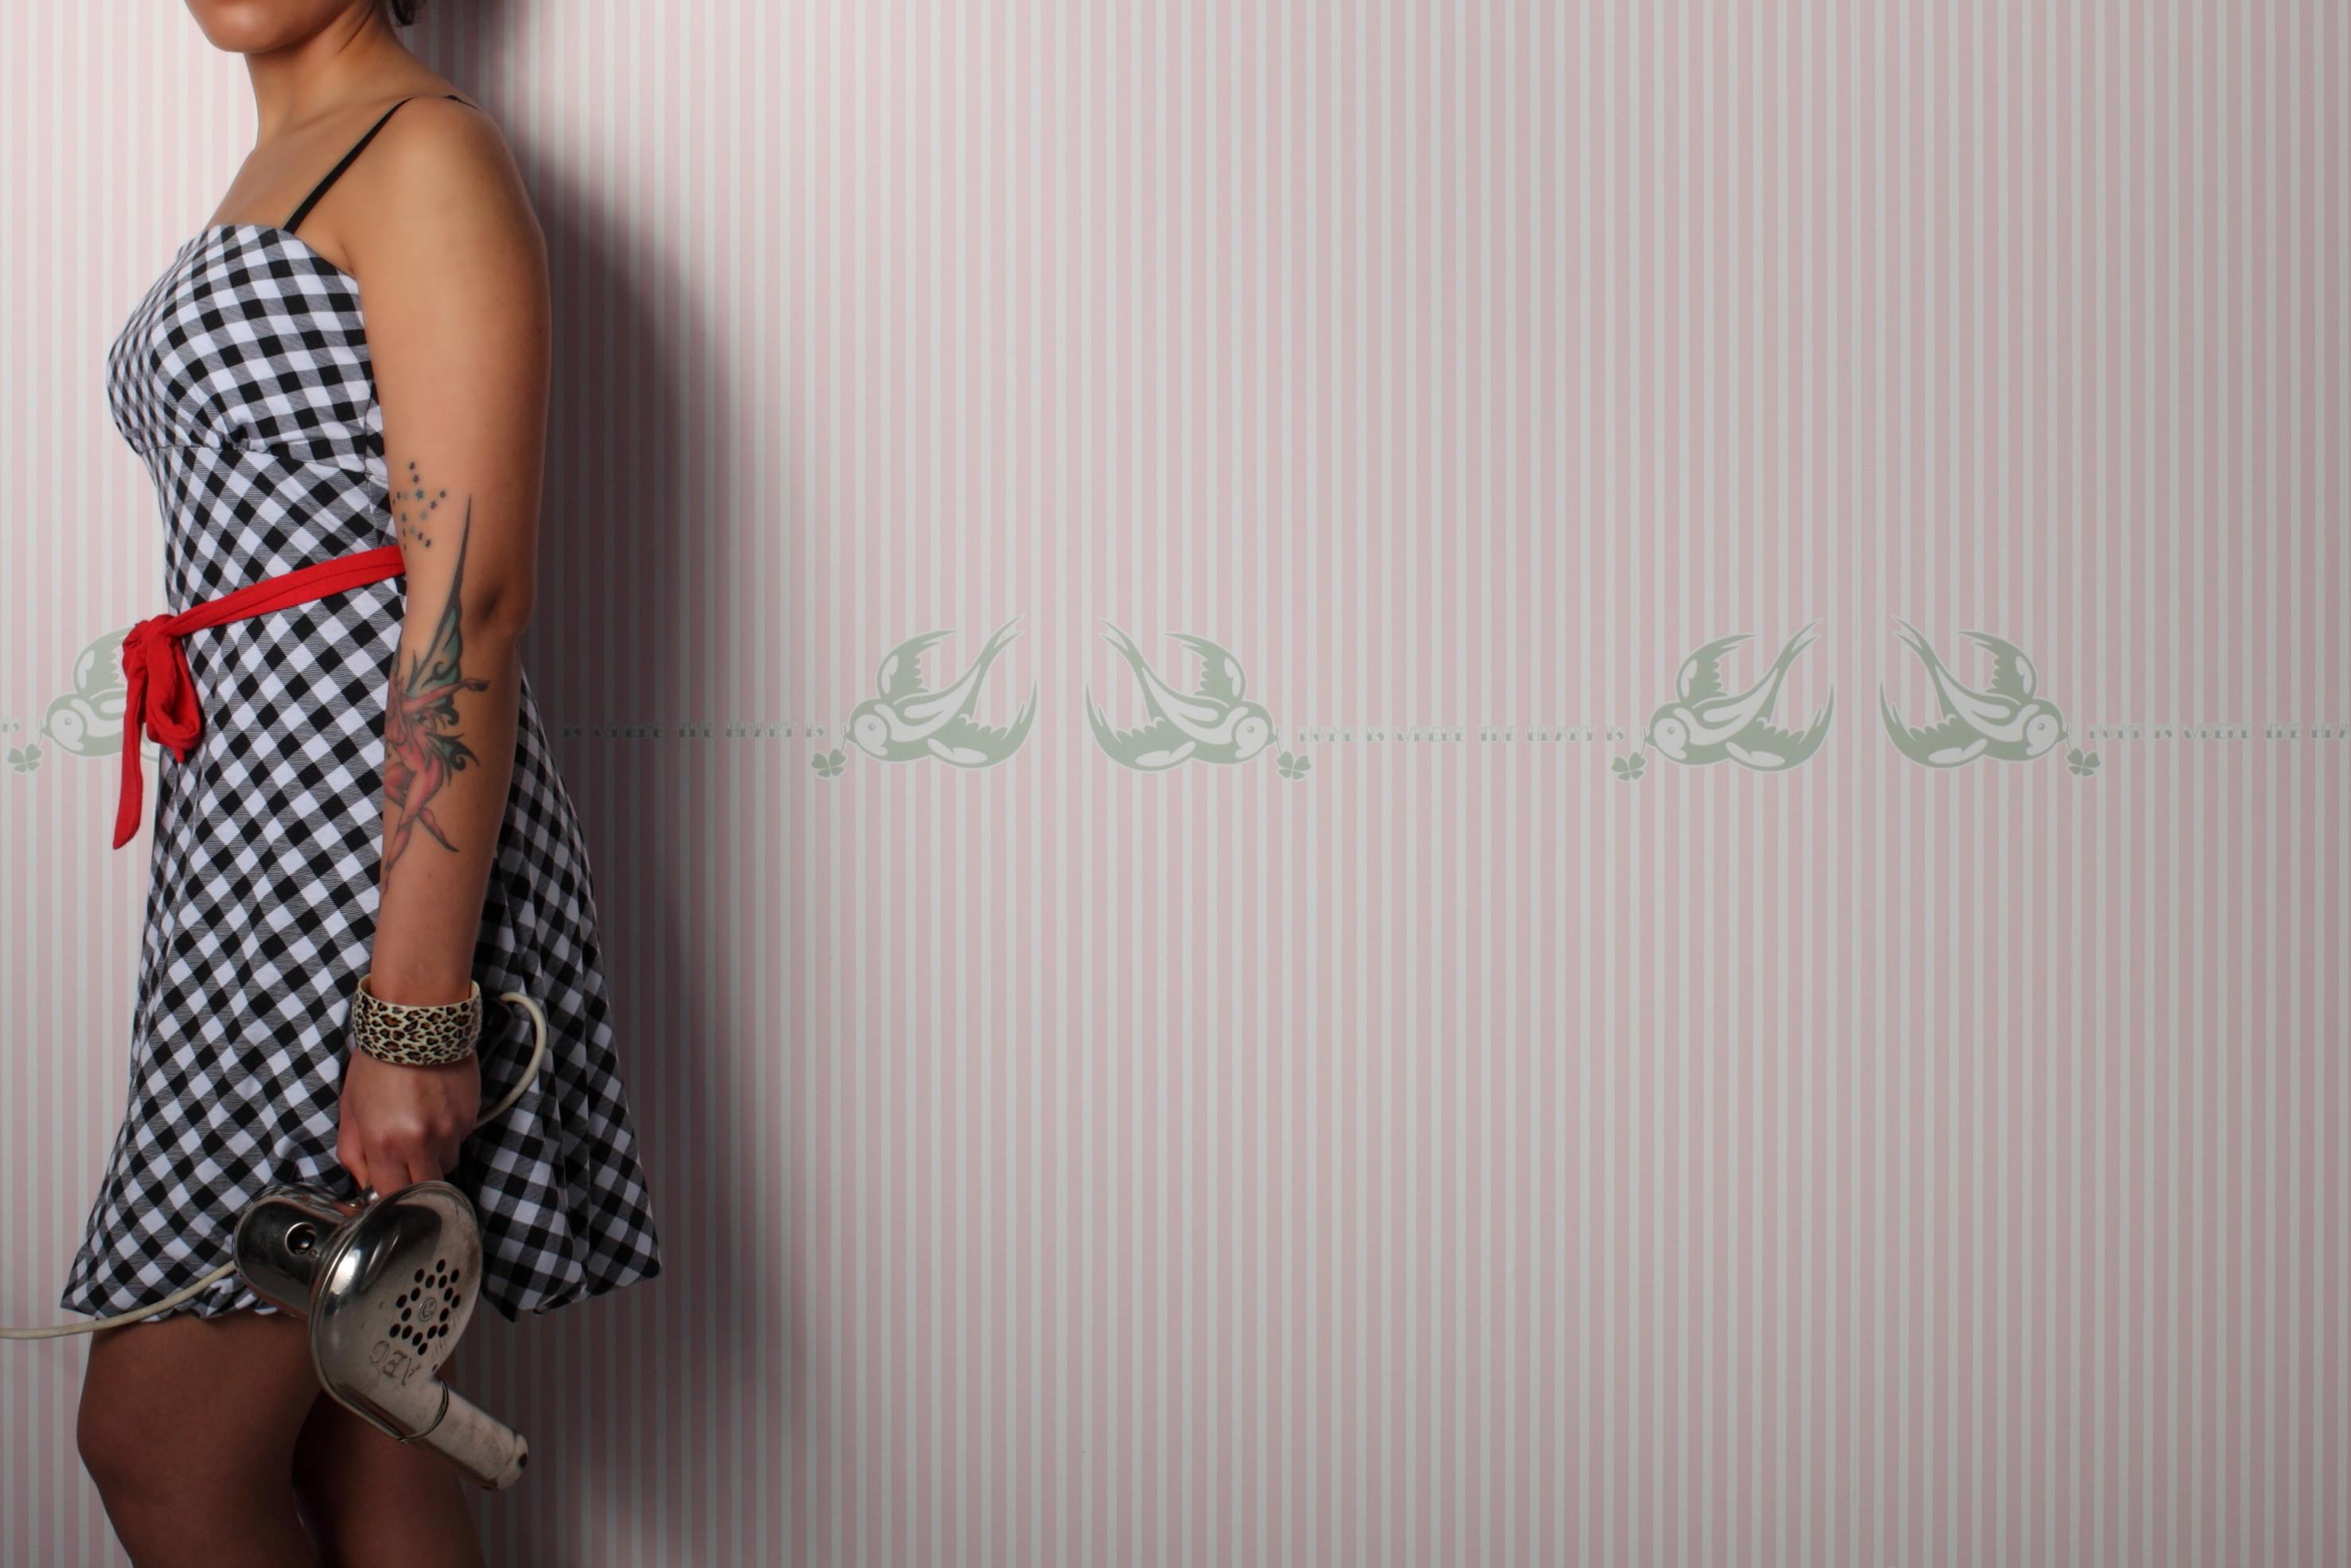 Res: 2954x1970, AS-Creation-designer-tapete-rockabilly-wallpaper